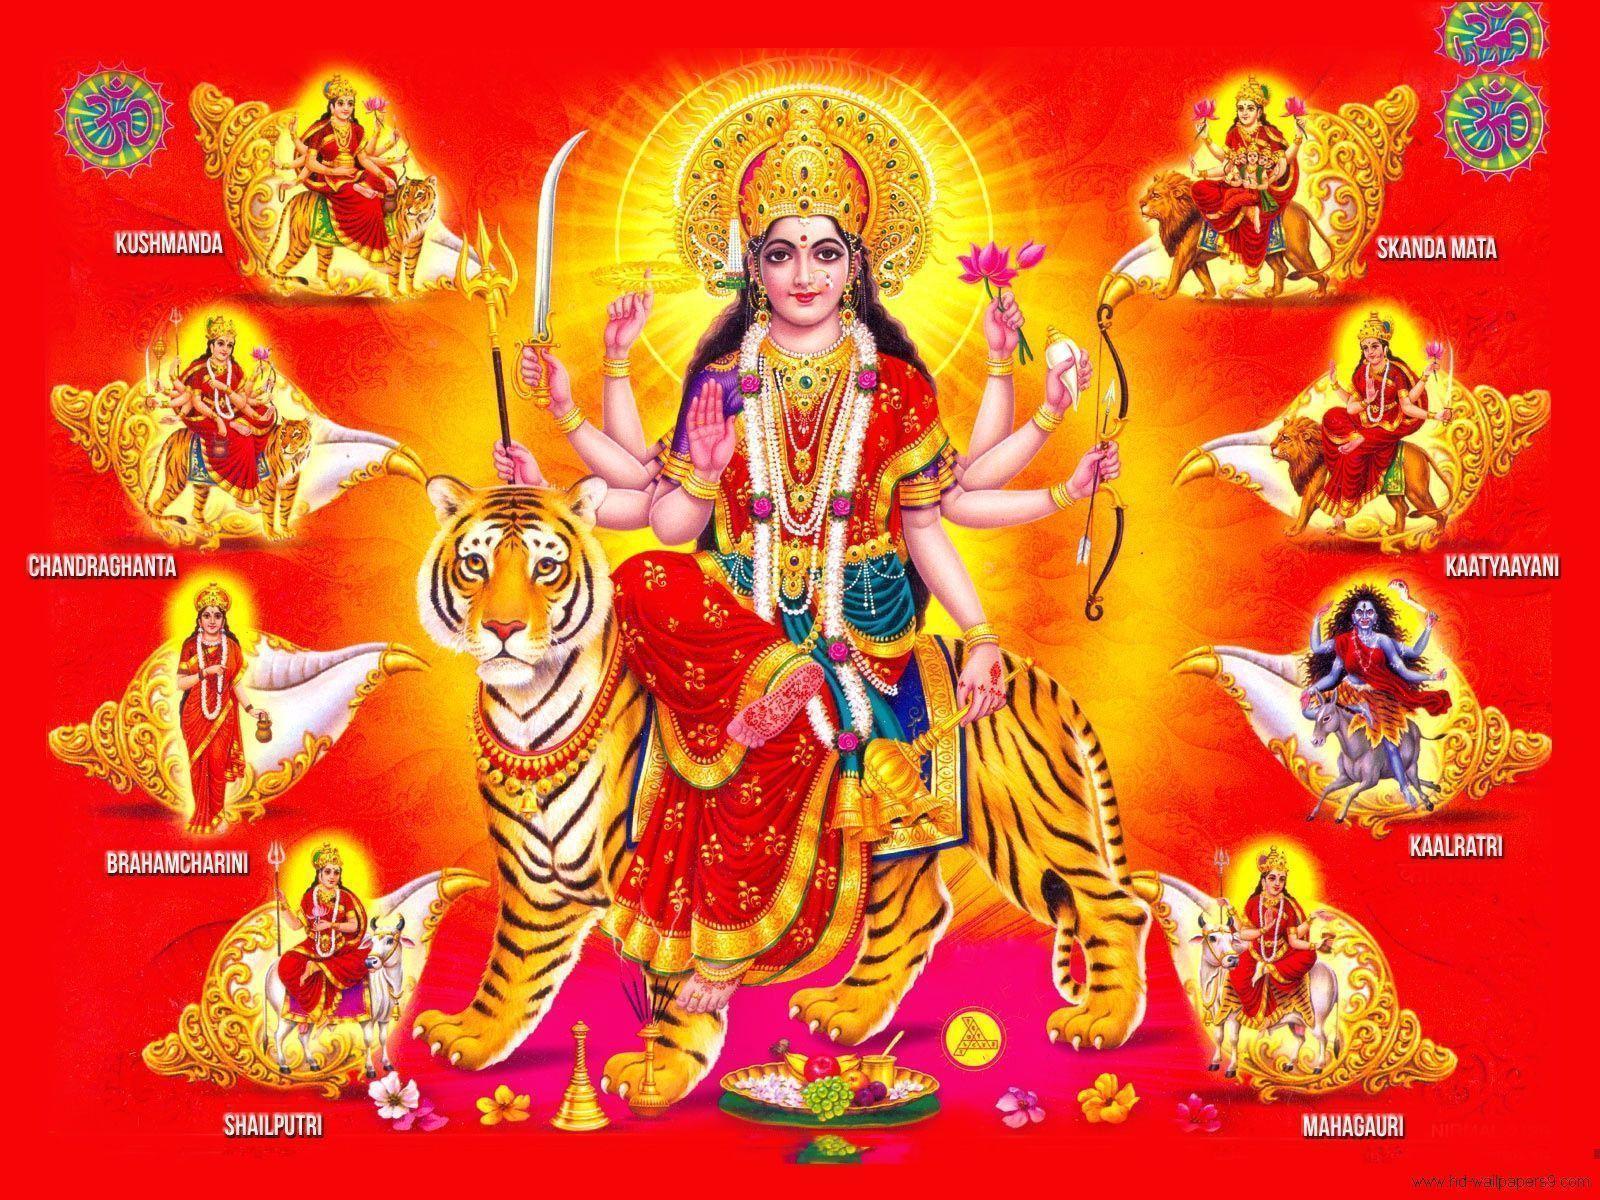 Durga Matha wallpapers backgrounds - Hindu god goddess wallpapers ...